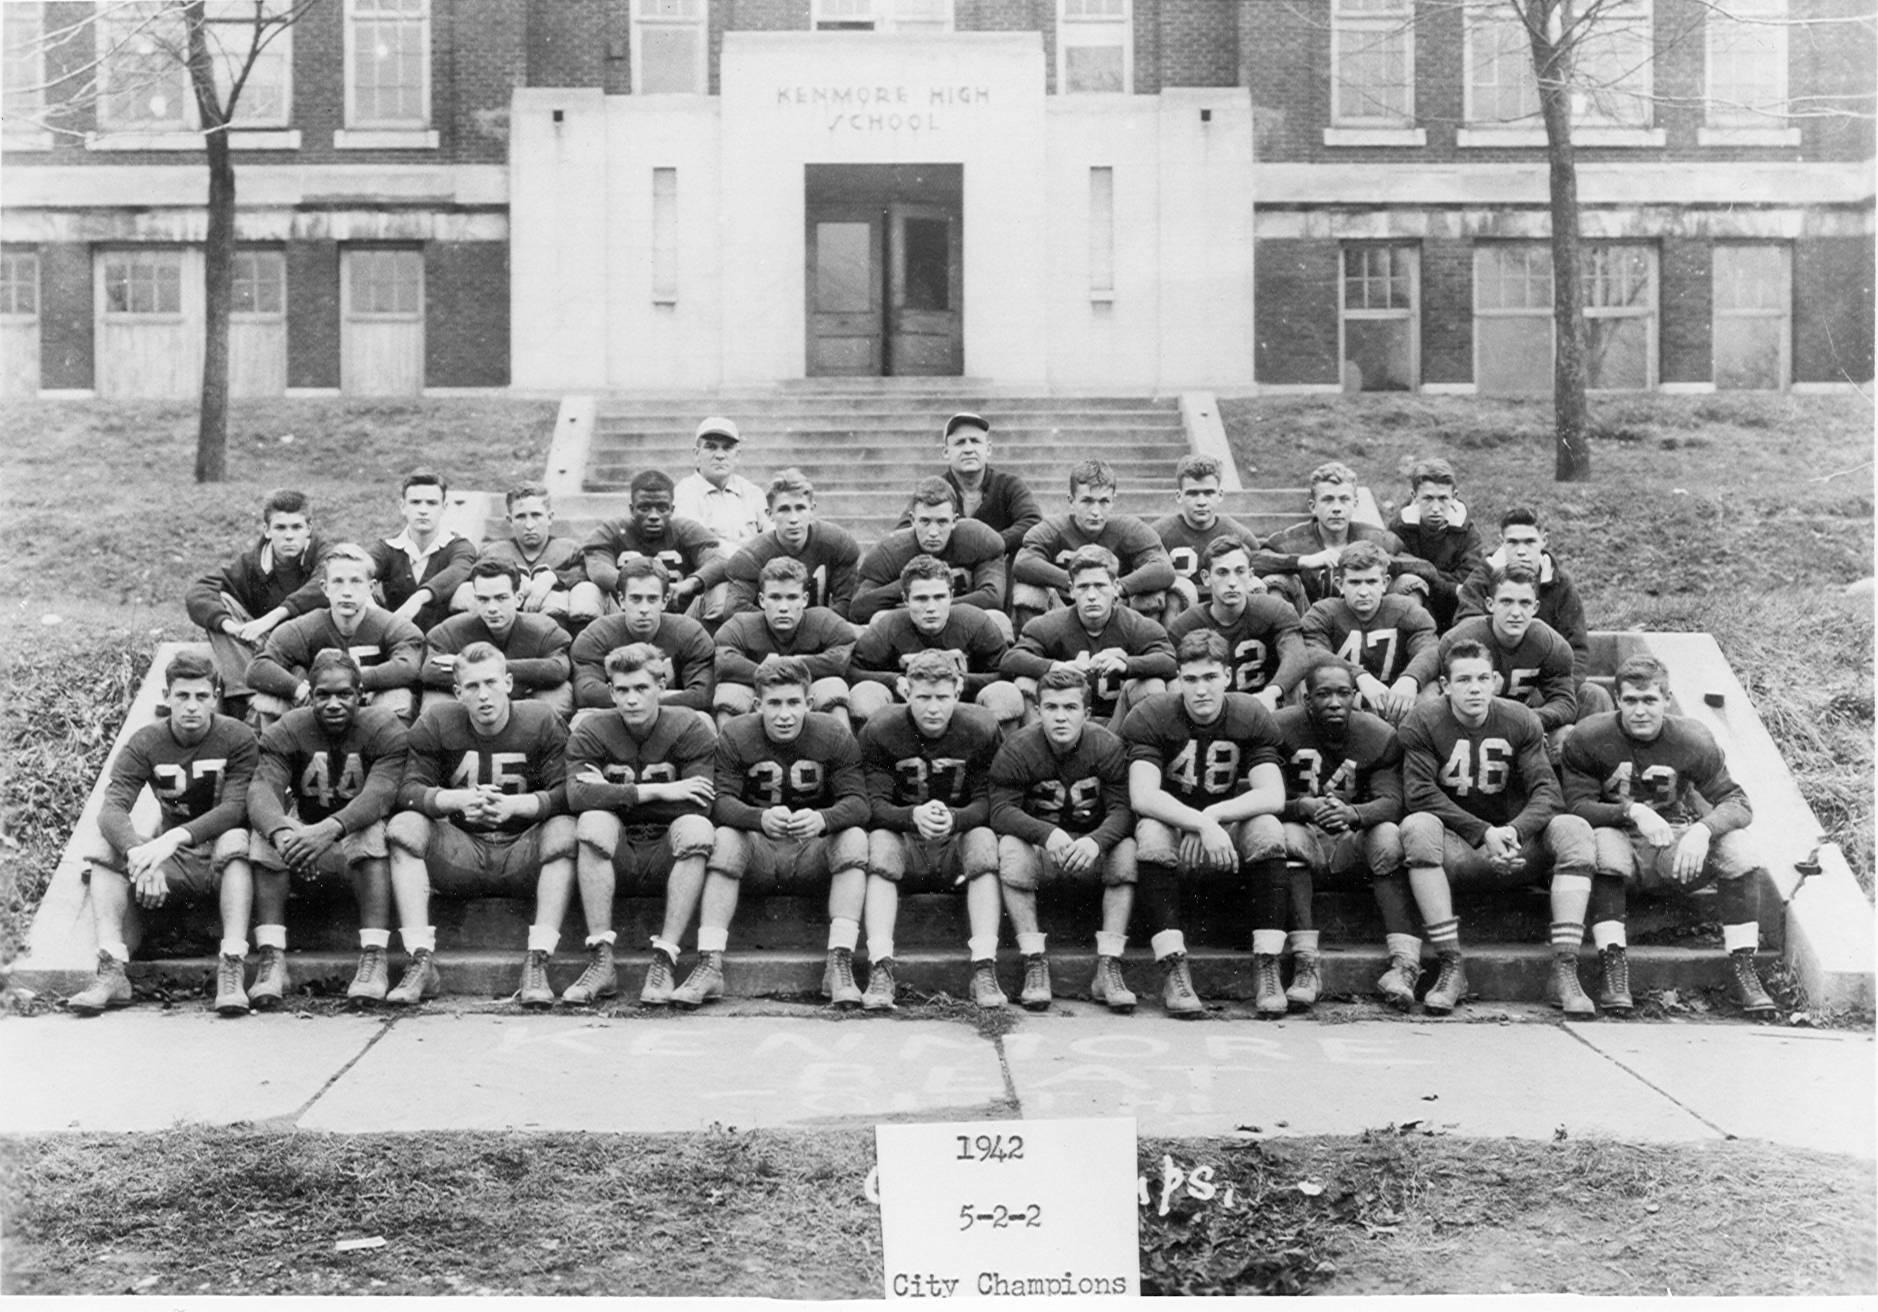 SPORTS - 1942 KHS FOOTBALL CITY CHAMPIONS.jpg